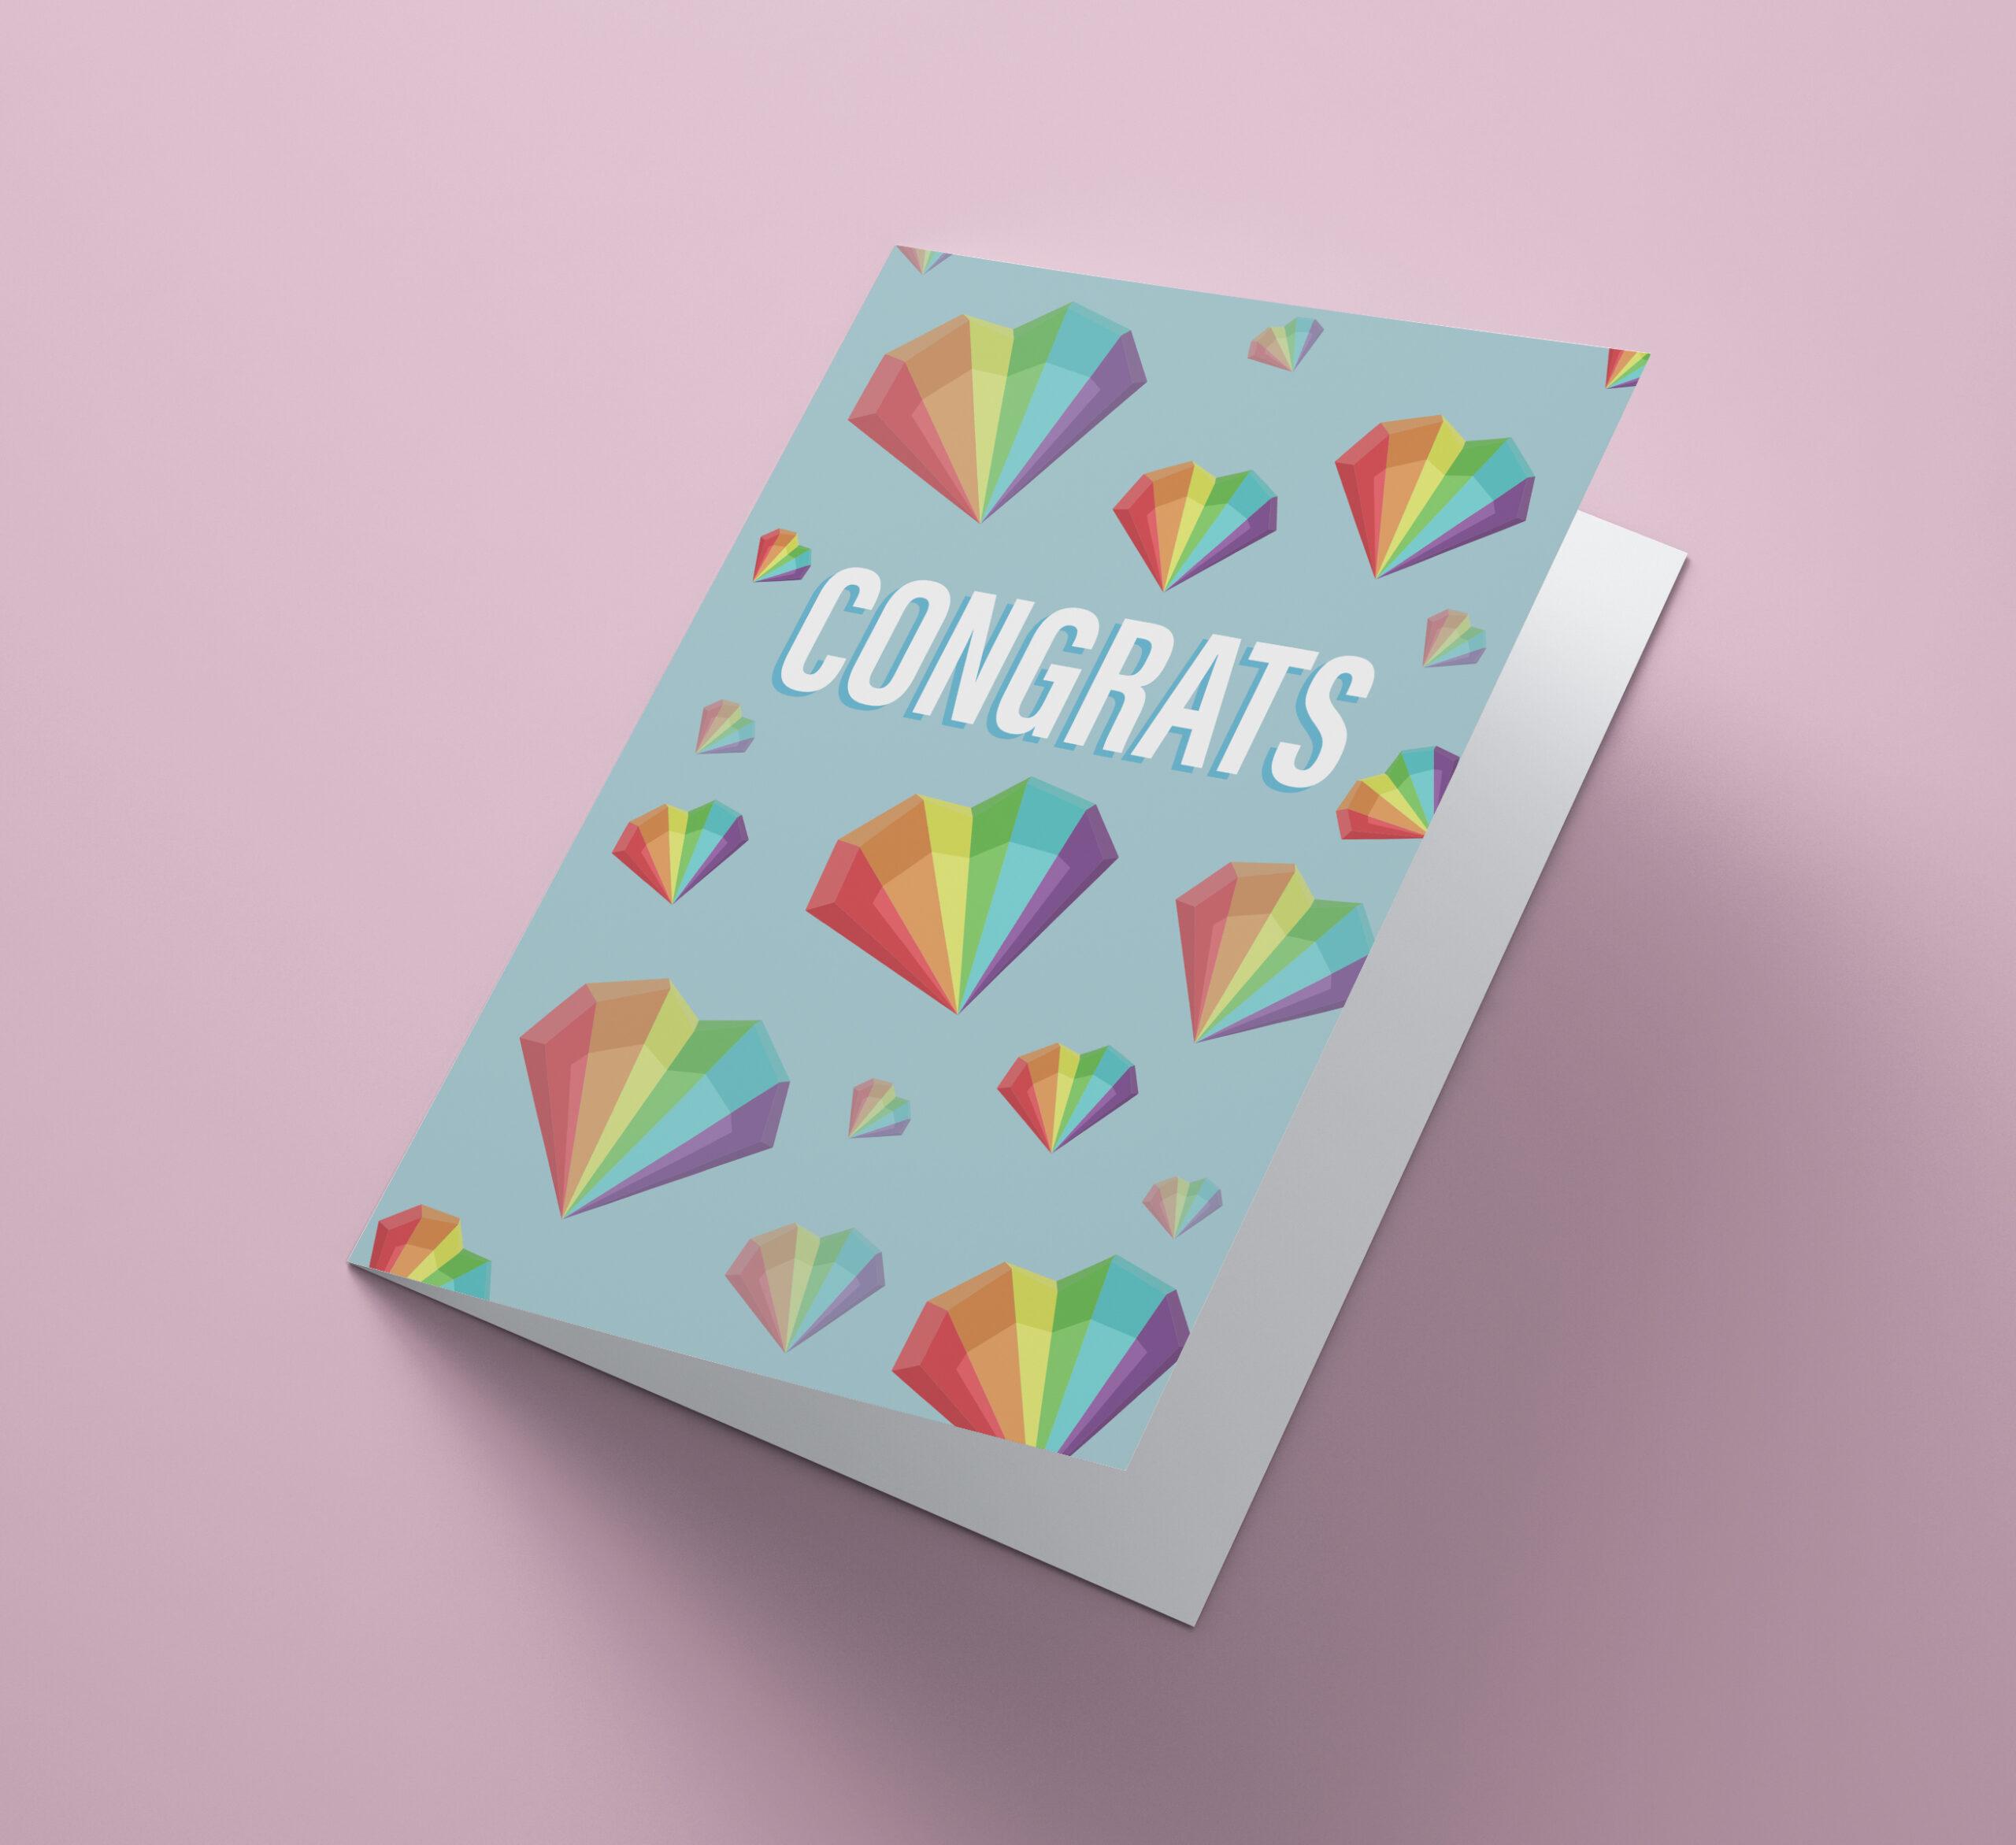 Congrats Rainbow Diamonds